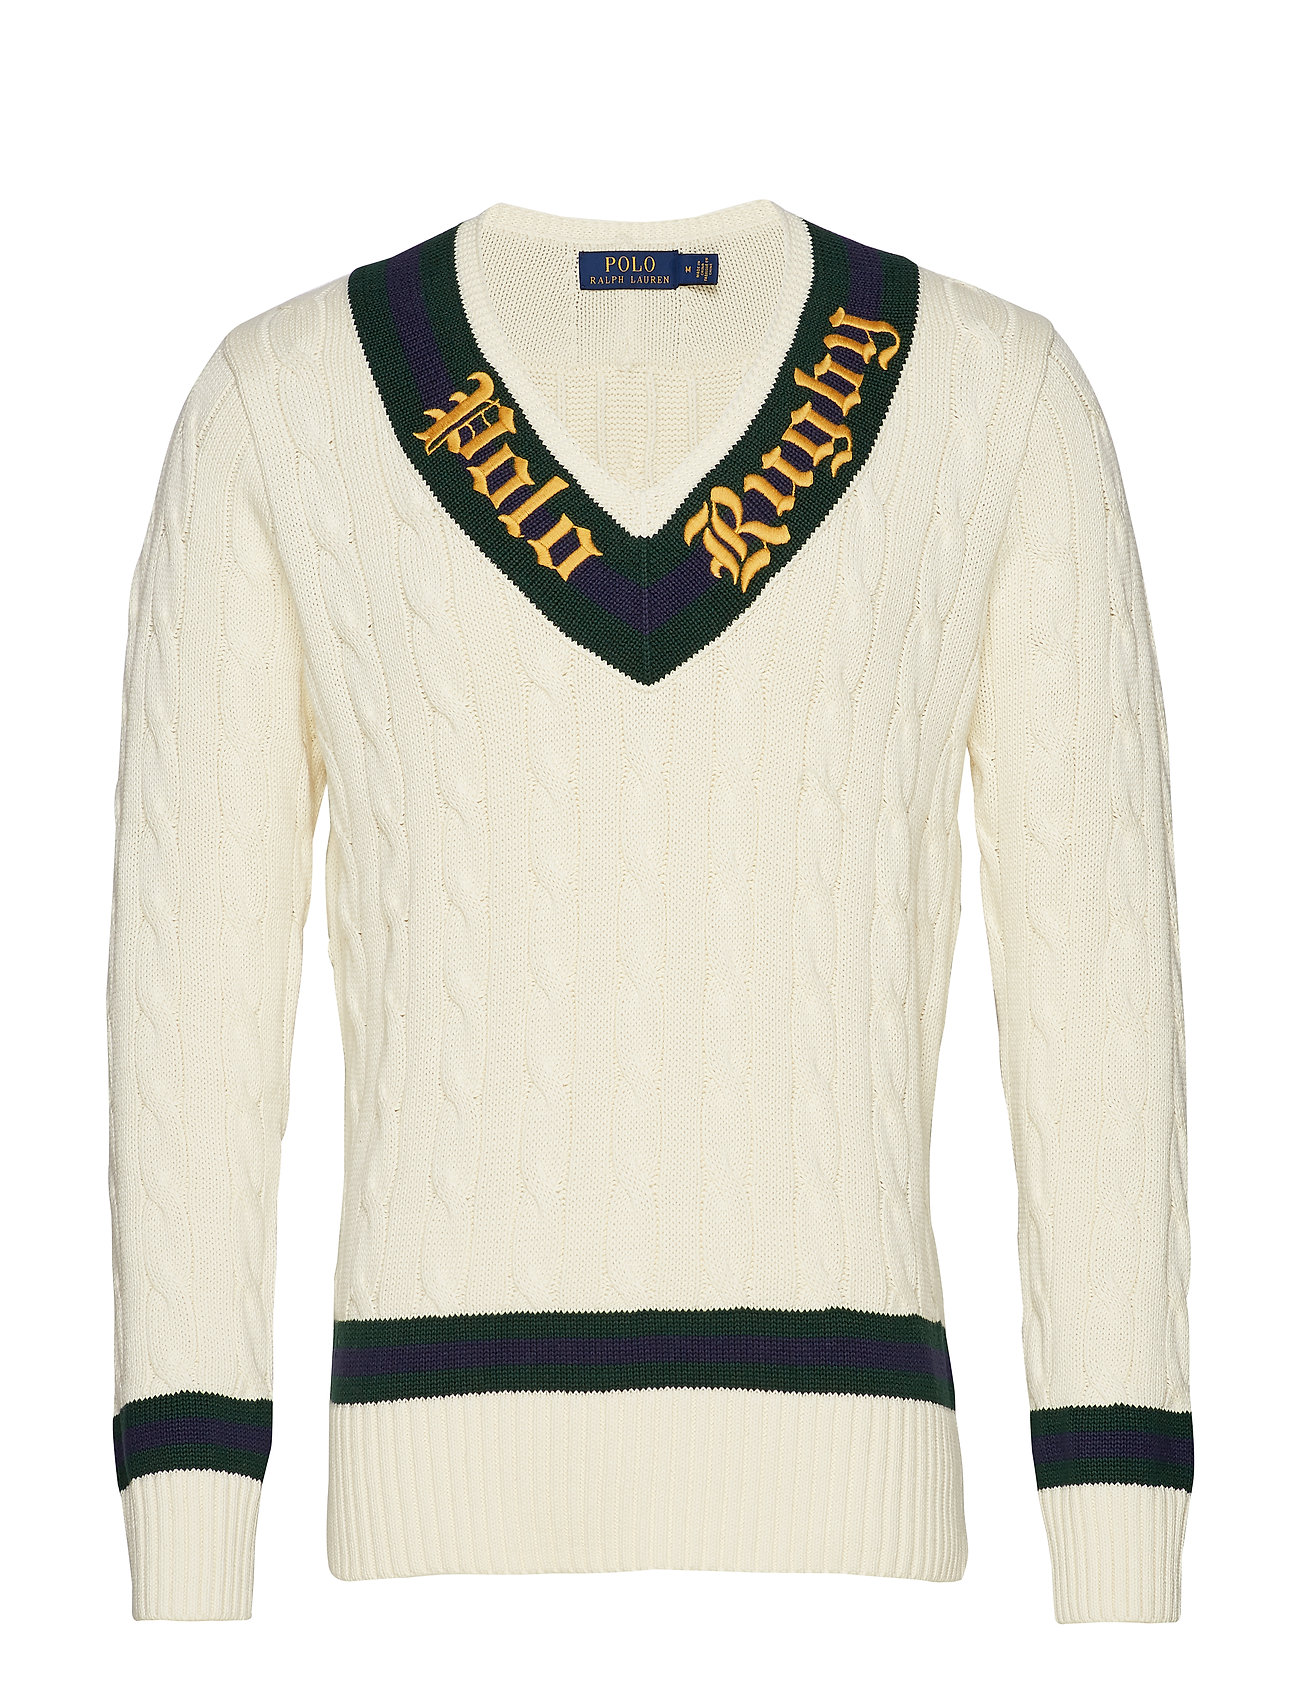 Polo Ralph Lauren Rugby Cricket Sweater - CREAM/FOREST/WINE